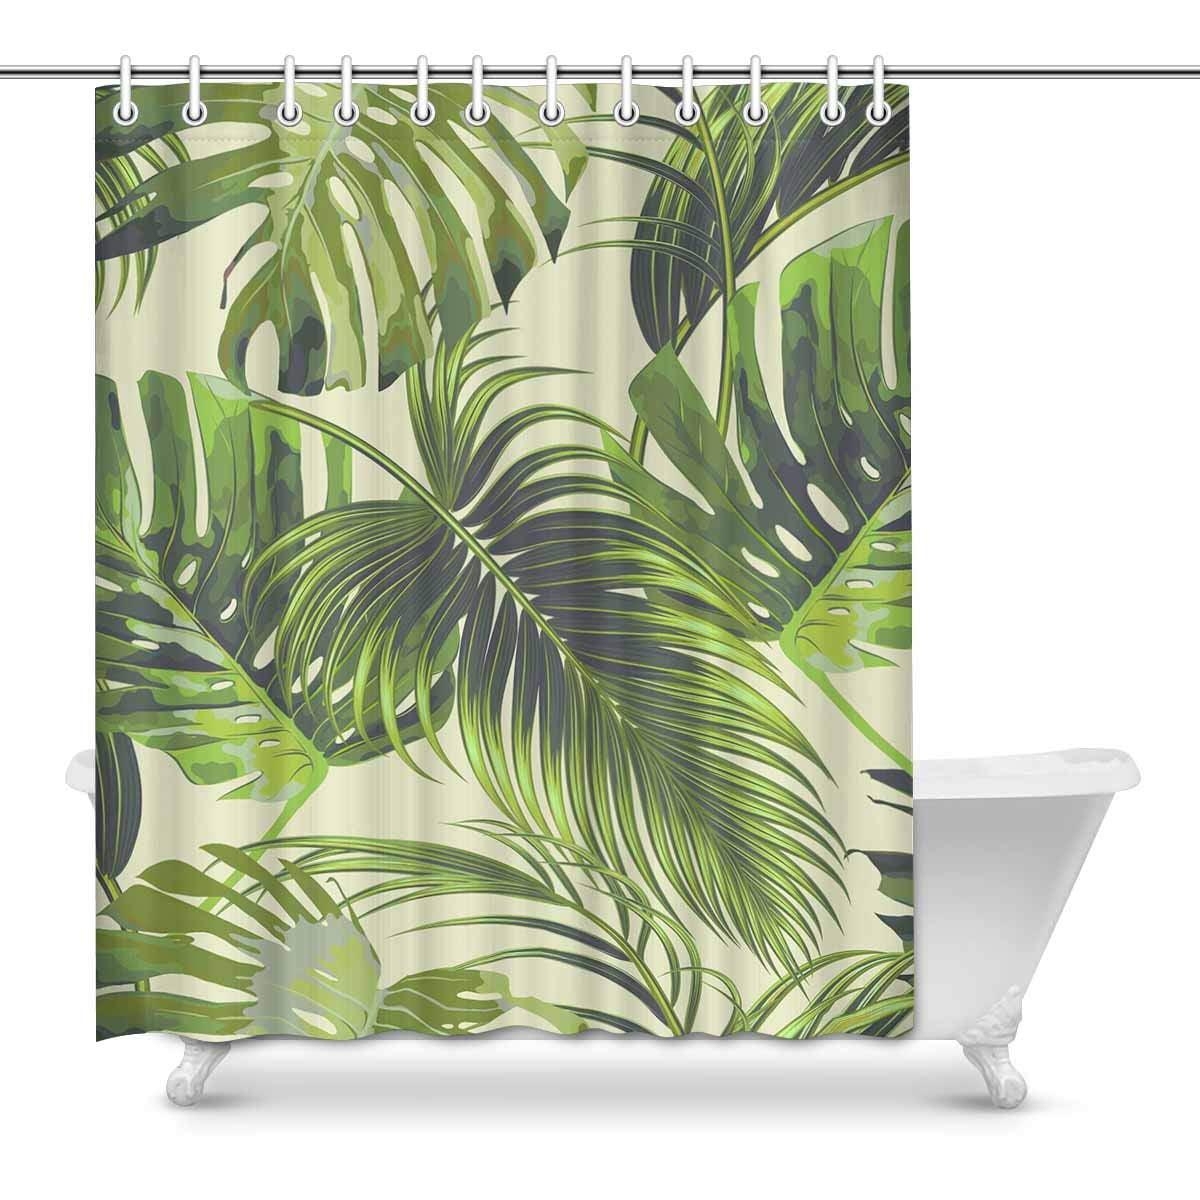 GCKG Tropical Palm Leaves Shower Curtain Jungle Leaf Floral